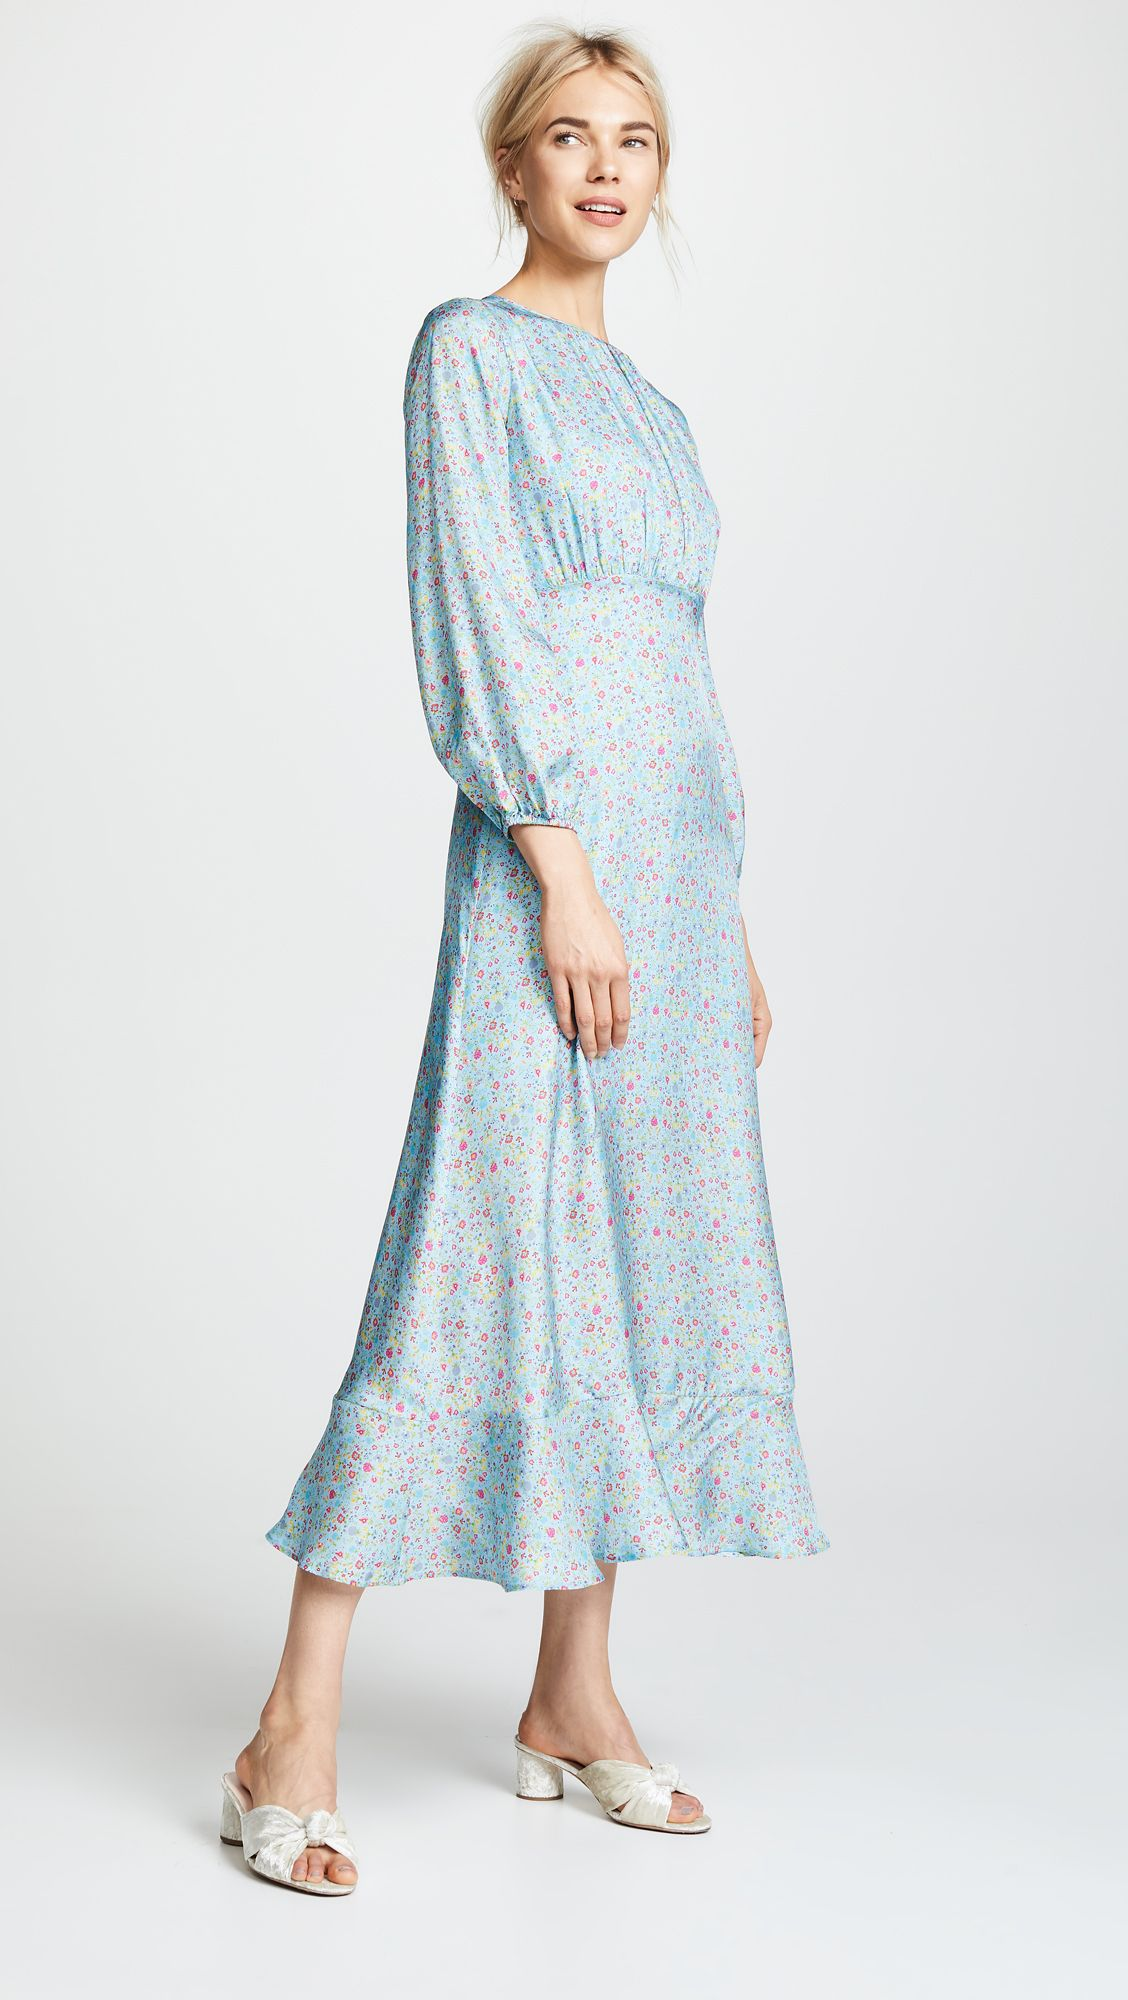 54ef81b1c09ab Sea Breeze Printed Dress |